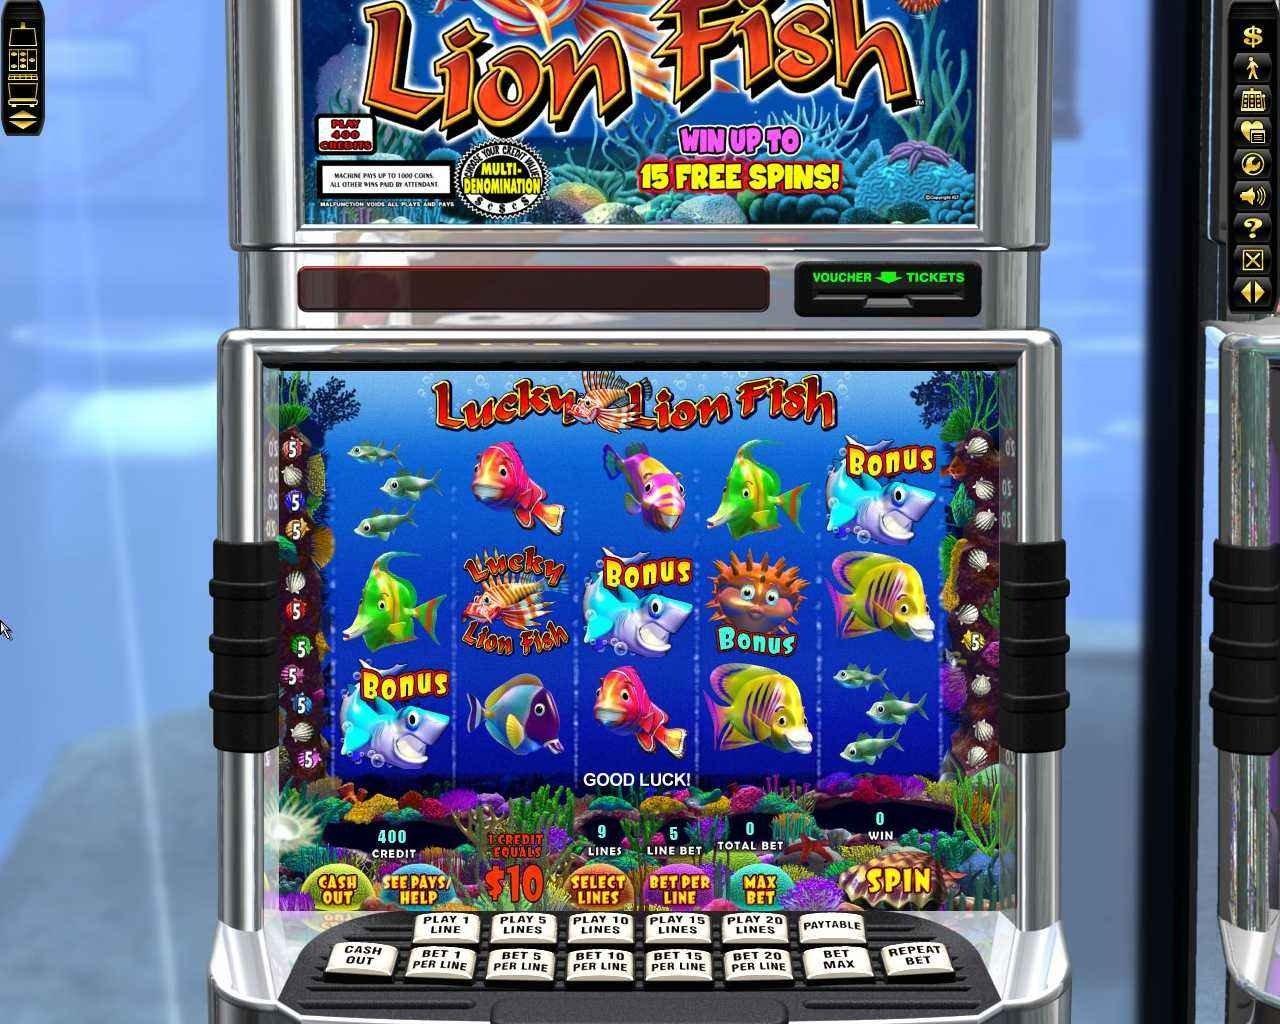 texas tea slot machine games